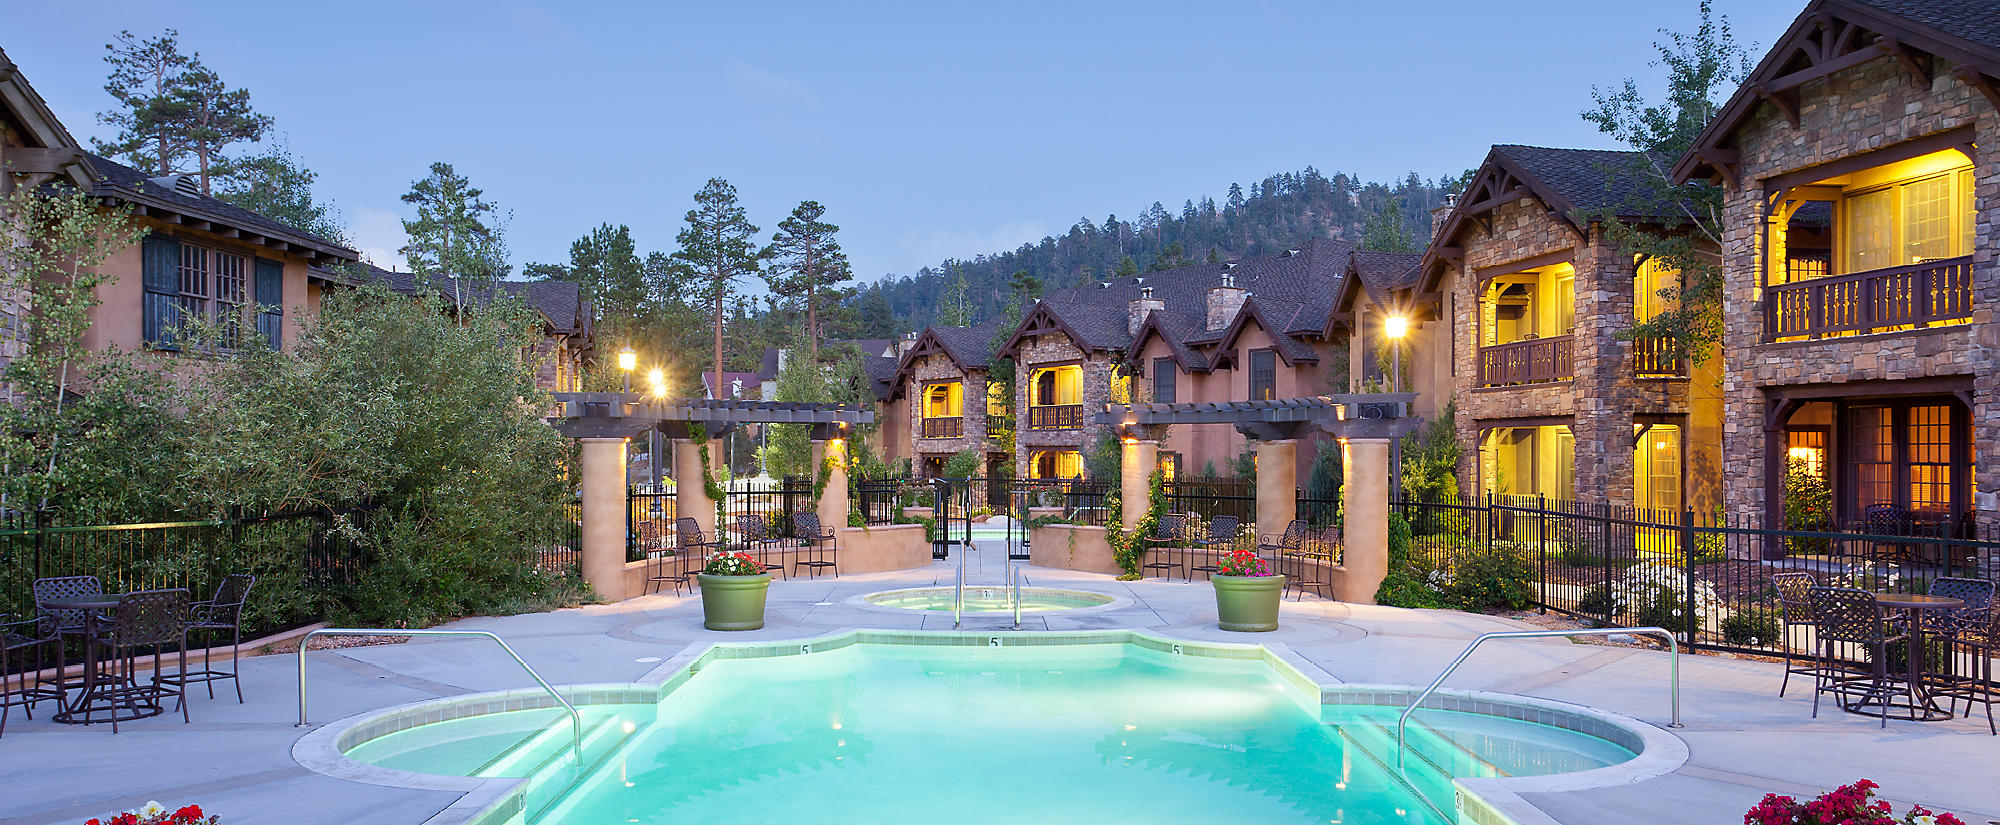 Big Bear California Map Google.Vacation In Big Bear Lake California Bluegreen Vacations